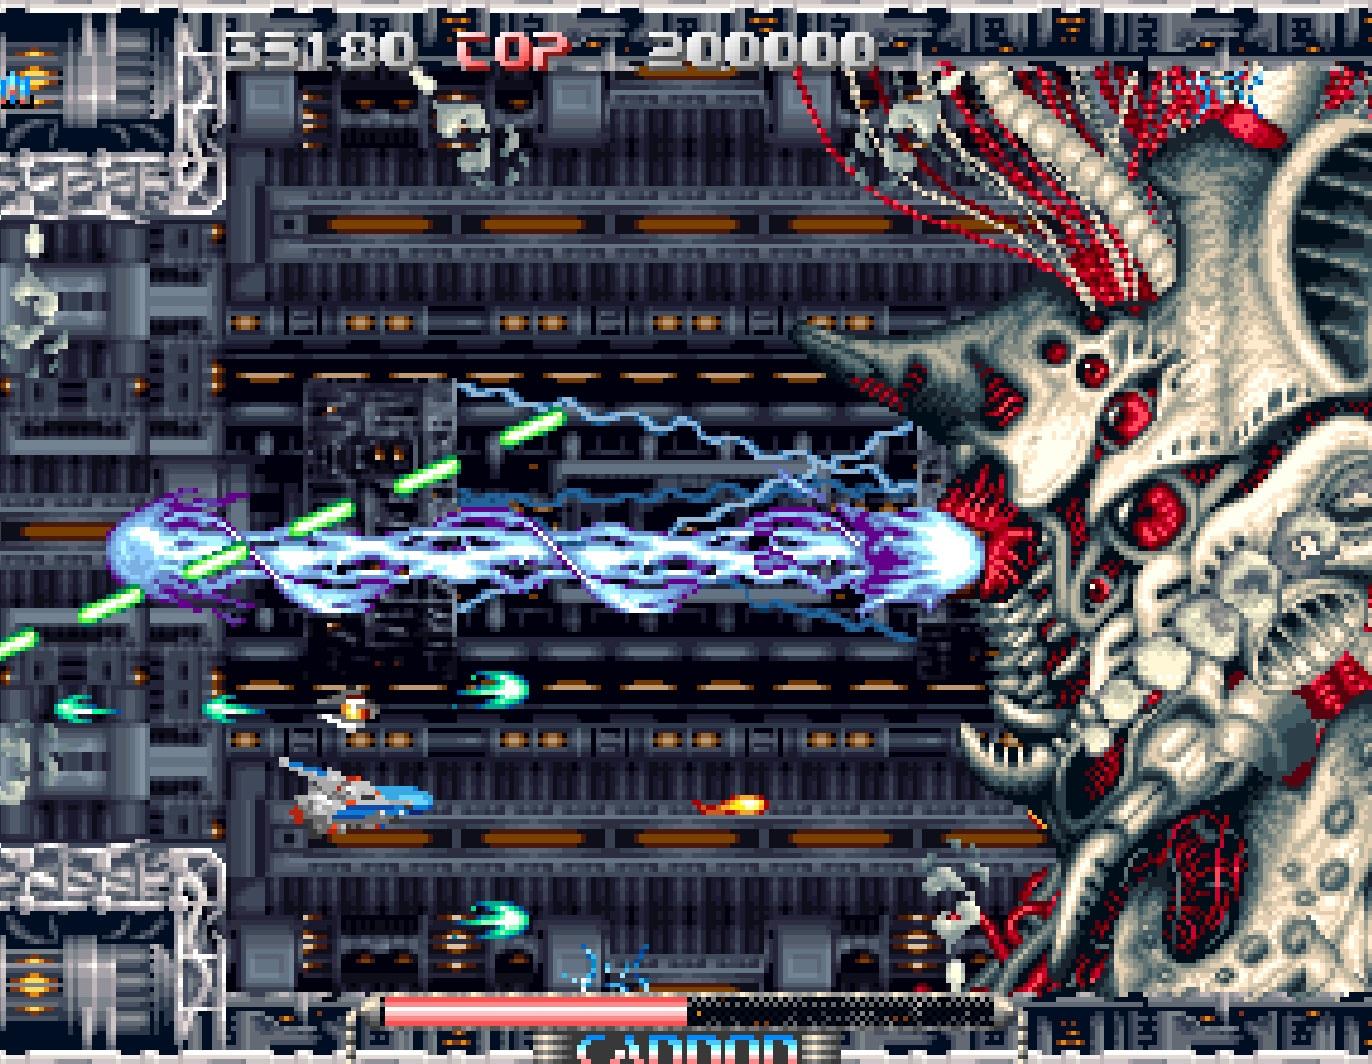 Neo Geo shmup Pulstar blasts onto Xbox One screenshot